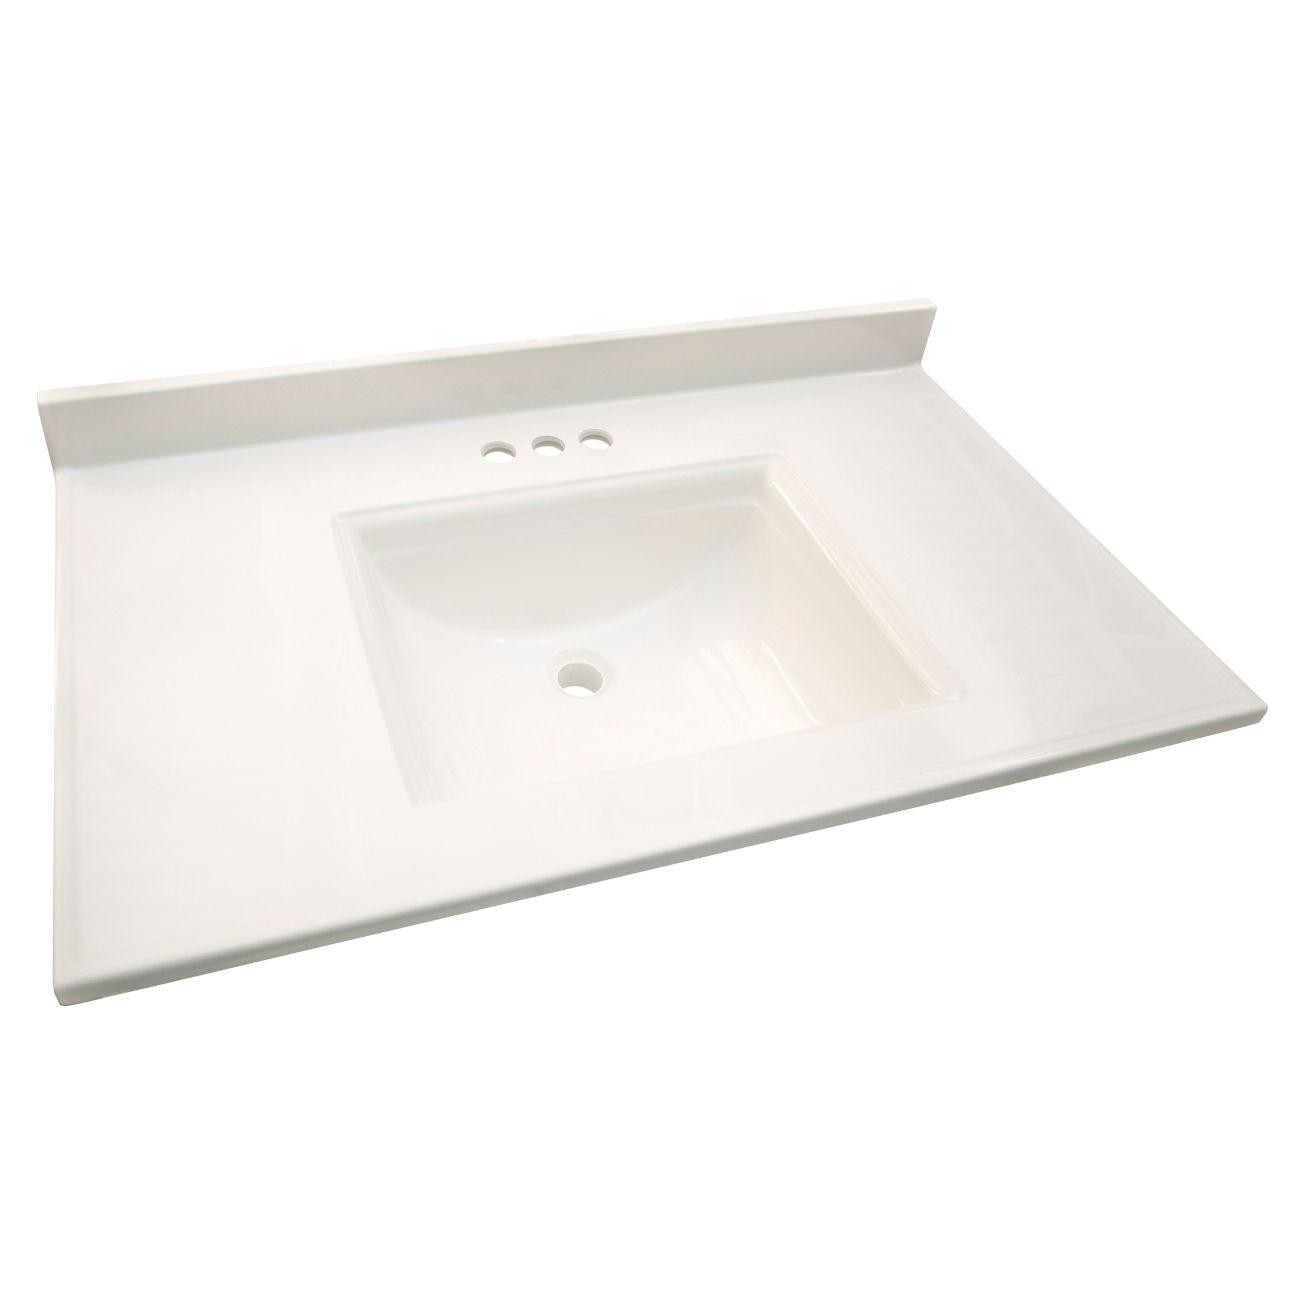 Design House Camilla 31in X 22in Vanity Top 557637 Base Top Separates Ace Hardware Bathroom Vanity Tops Marble Vanity Single Sink Bathroom Vanity